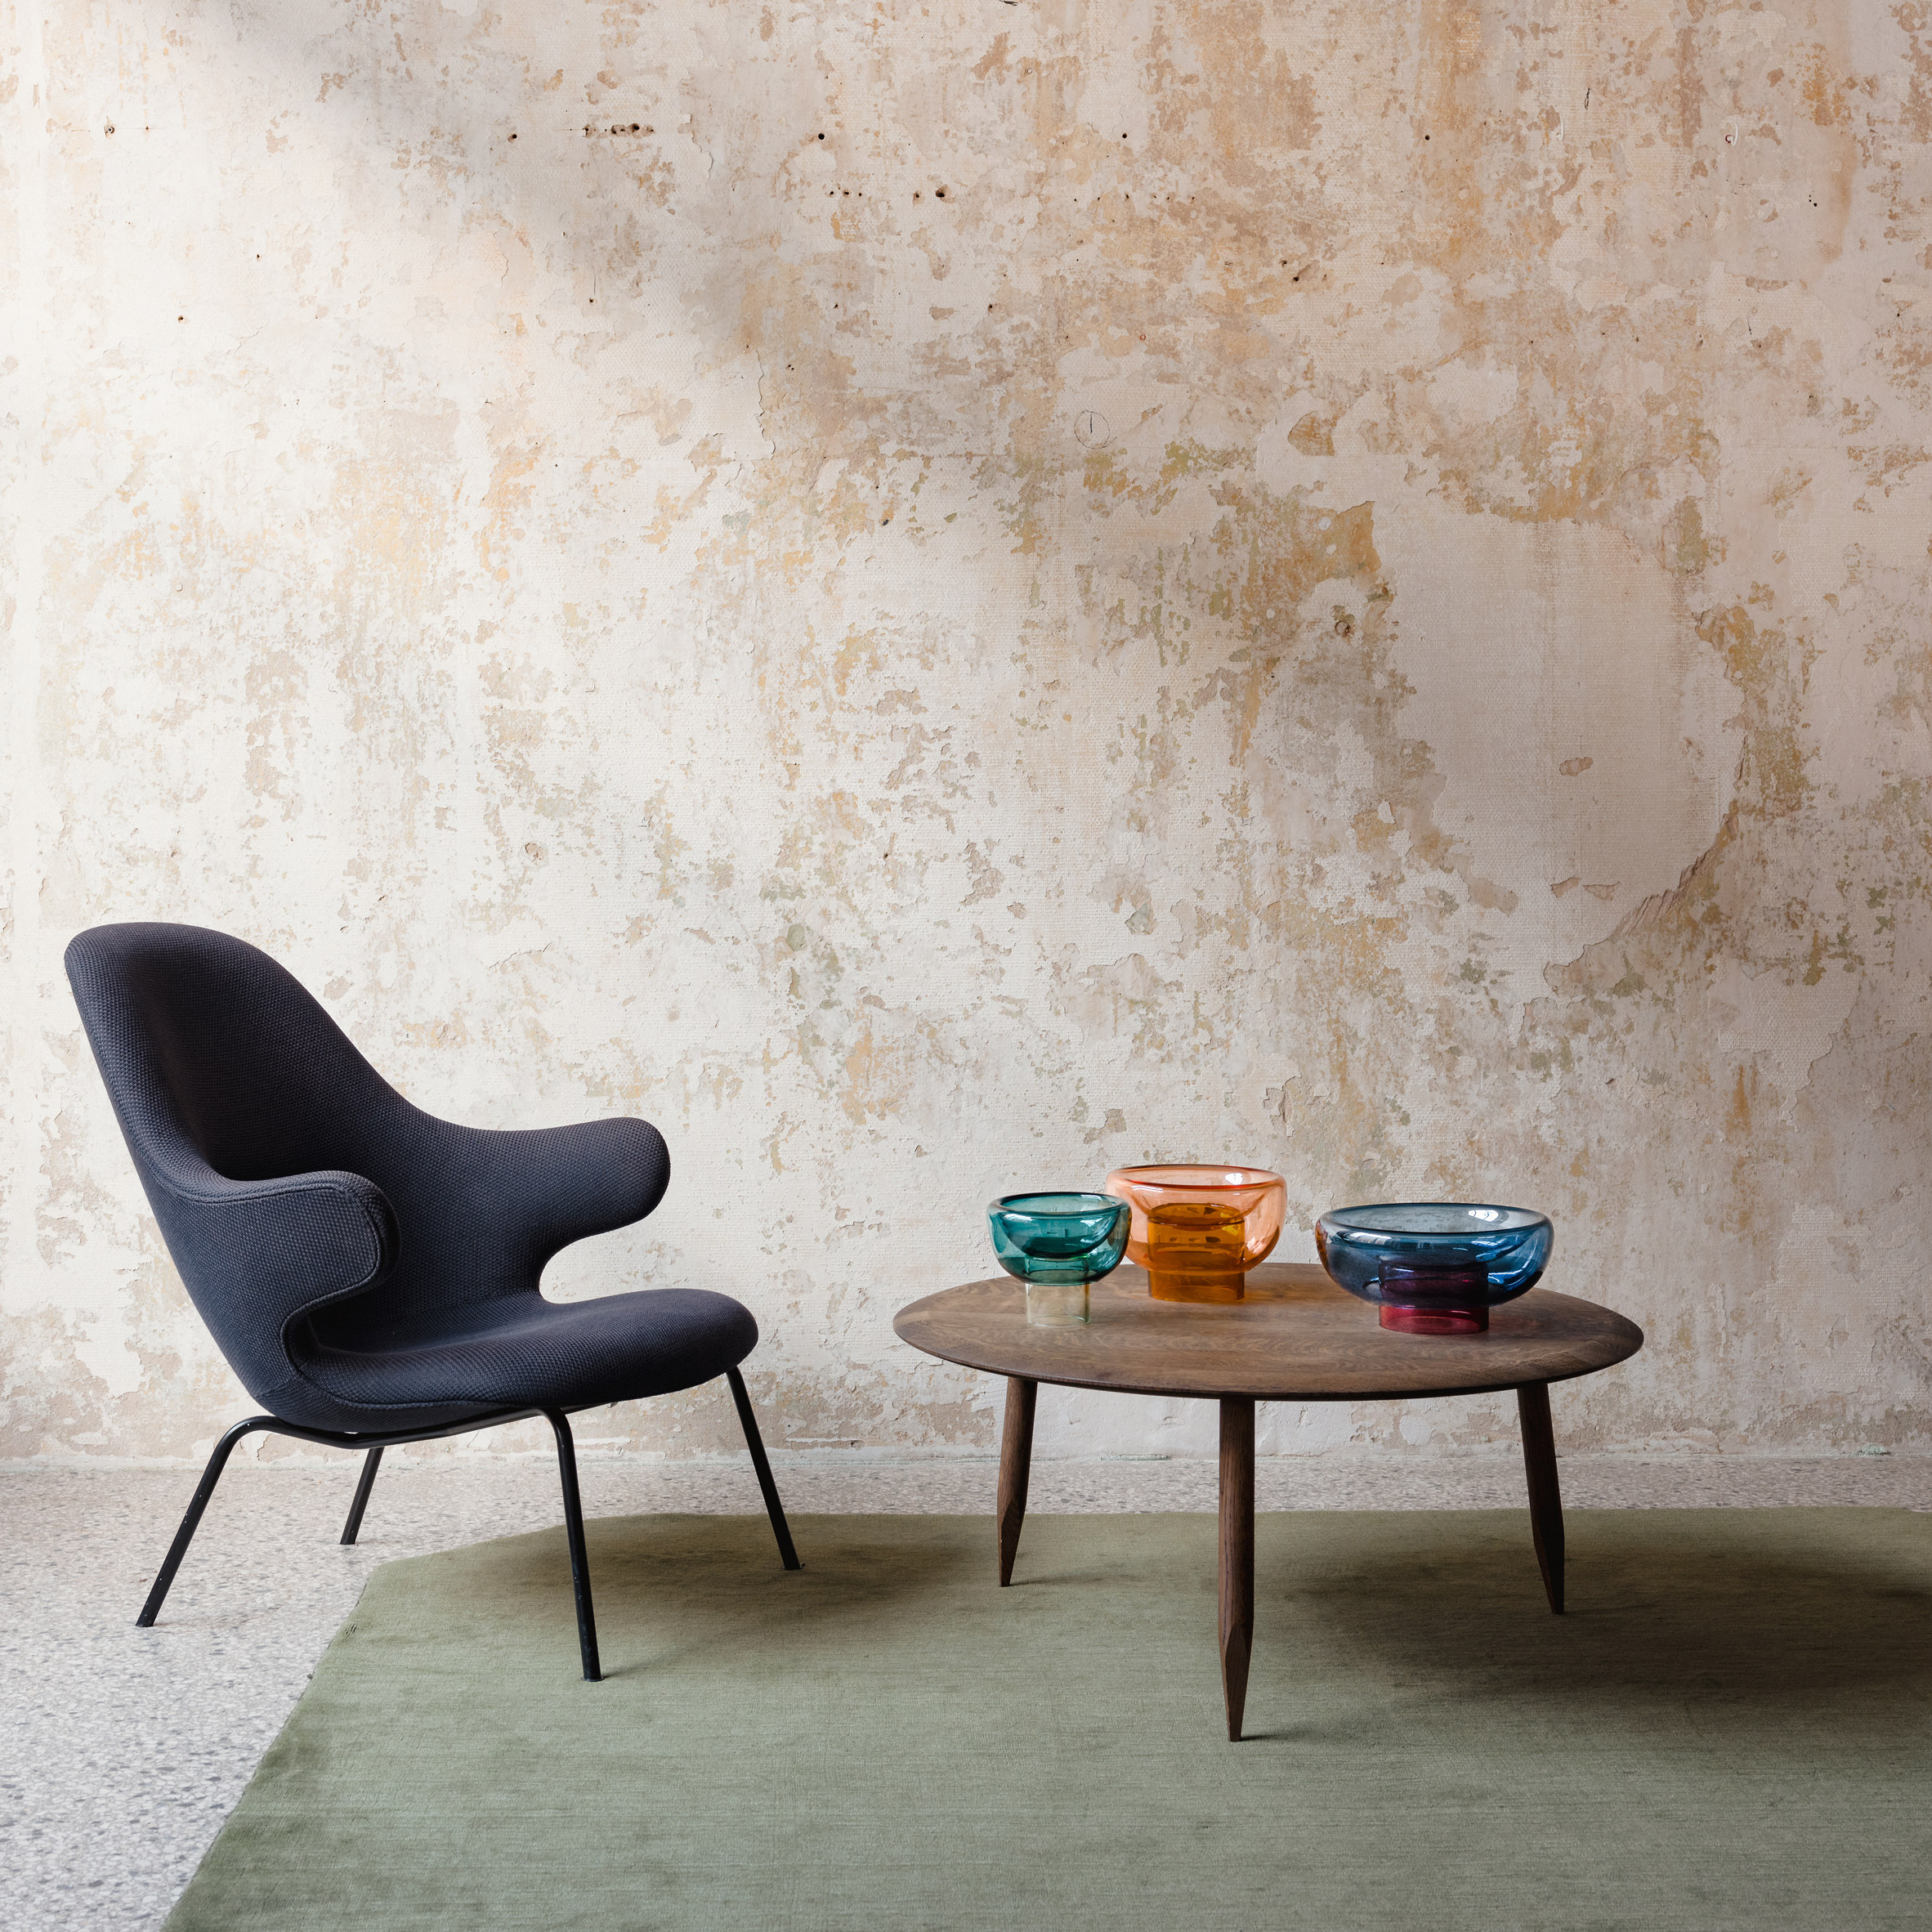 Sphere Bowls by Milena Kling for Studio Hausen